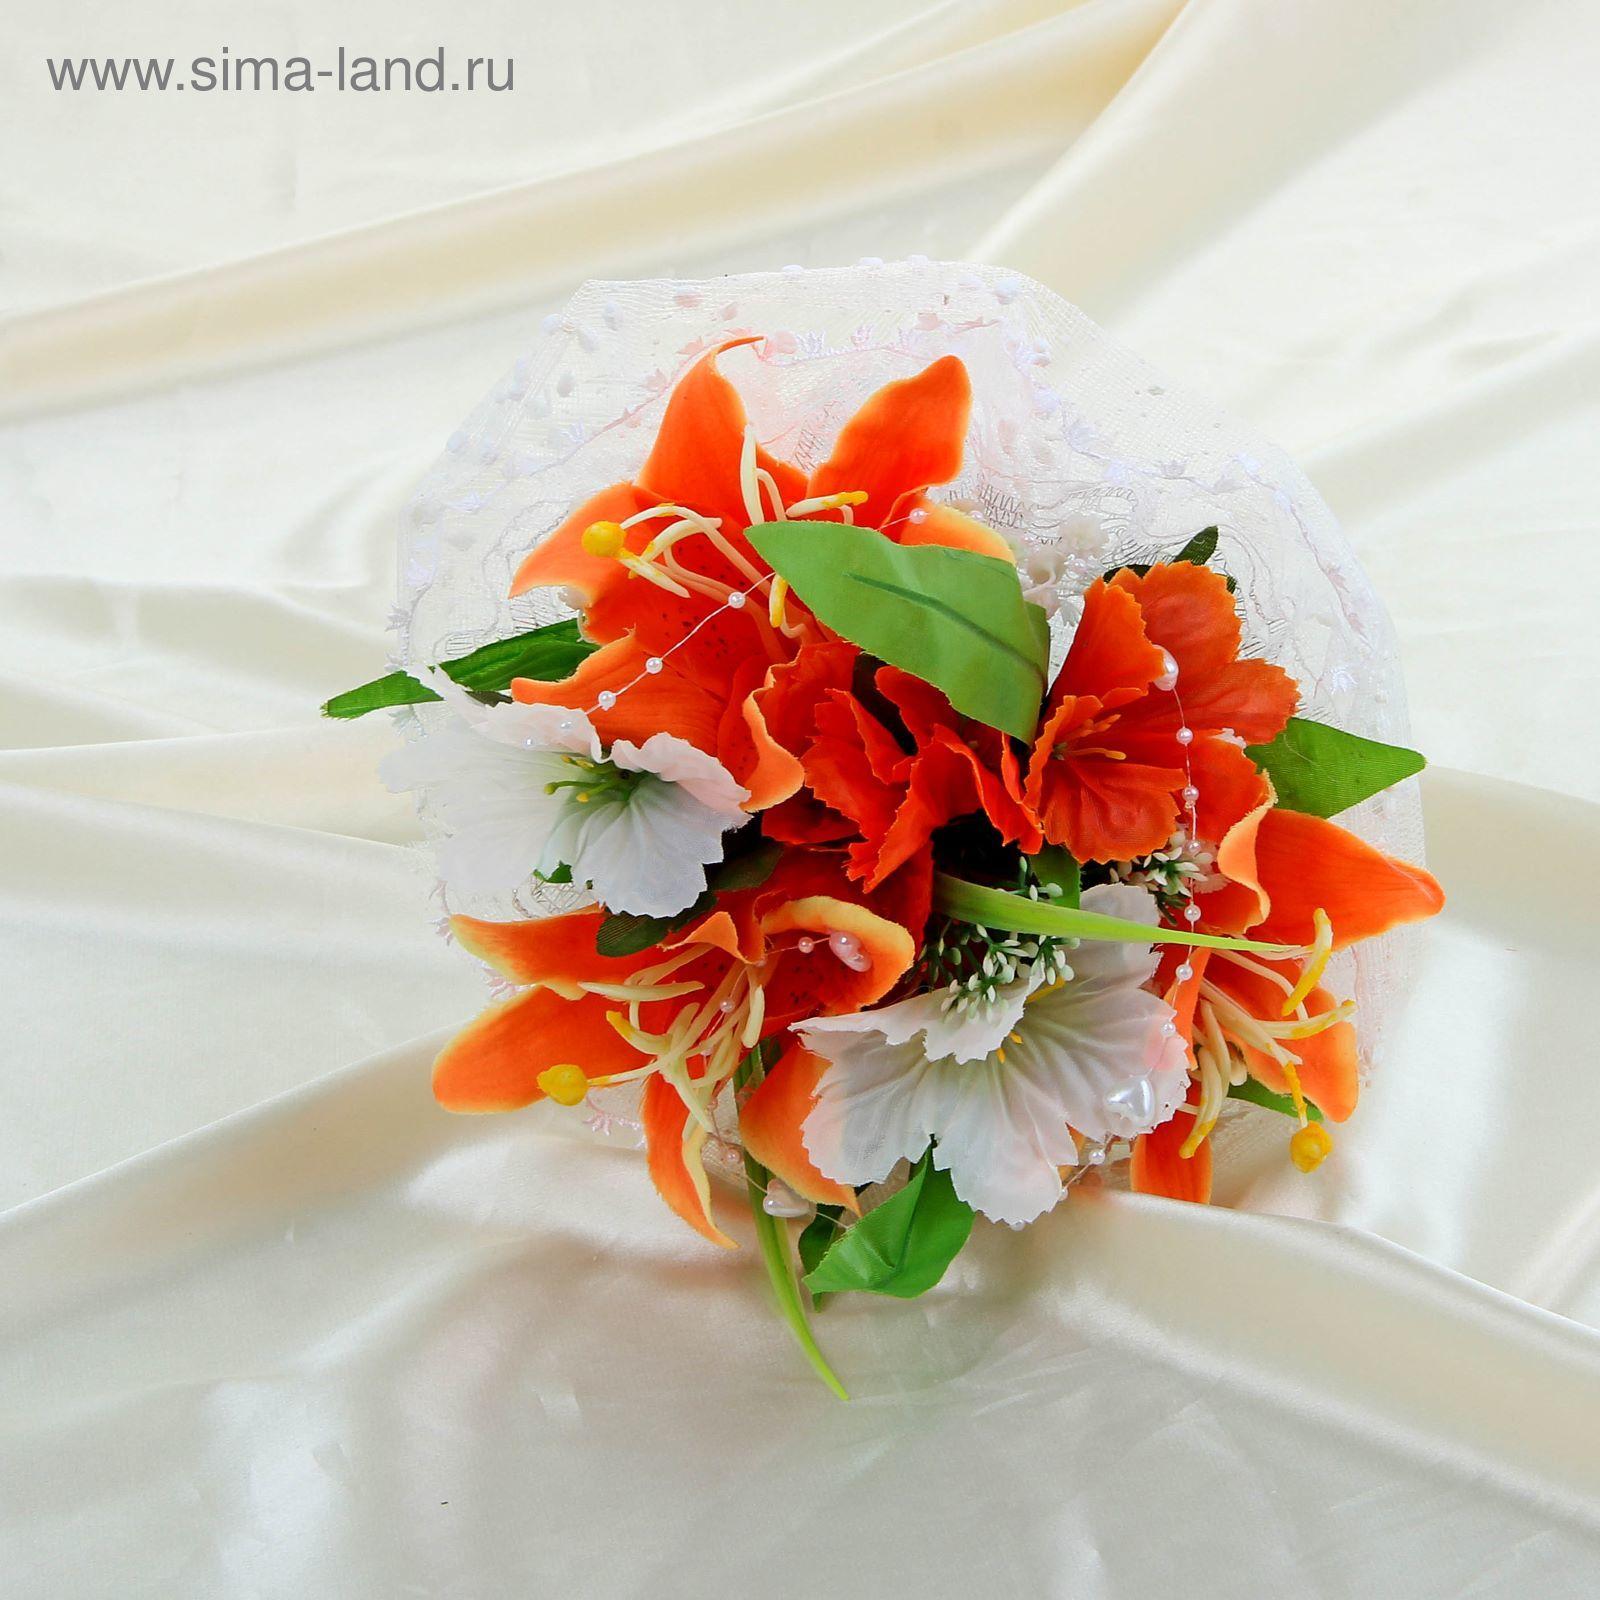 oranzhevie-lilii-buket-podsolnuhov-svoimi-rukami